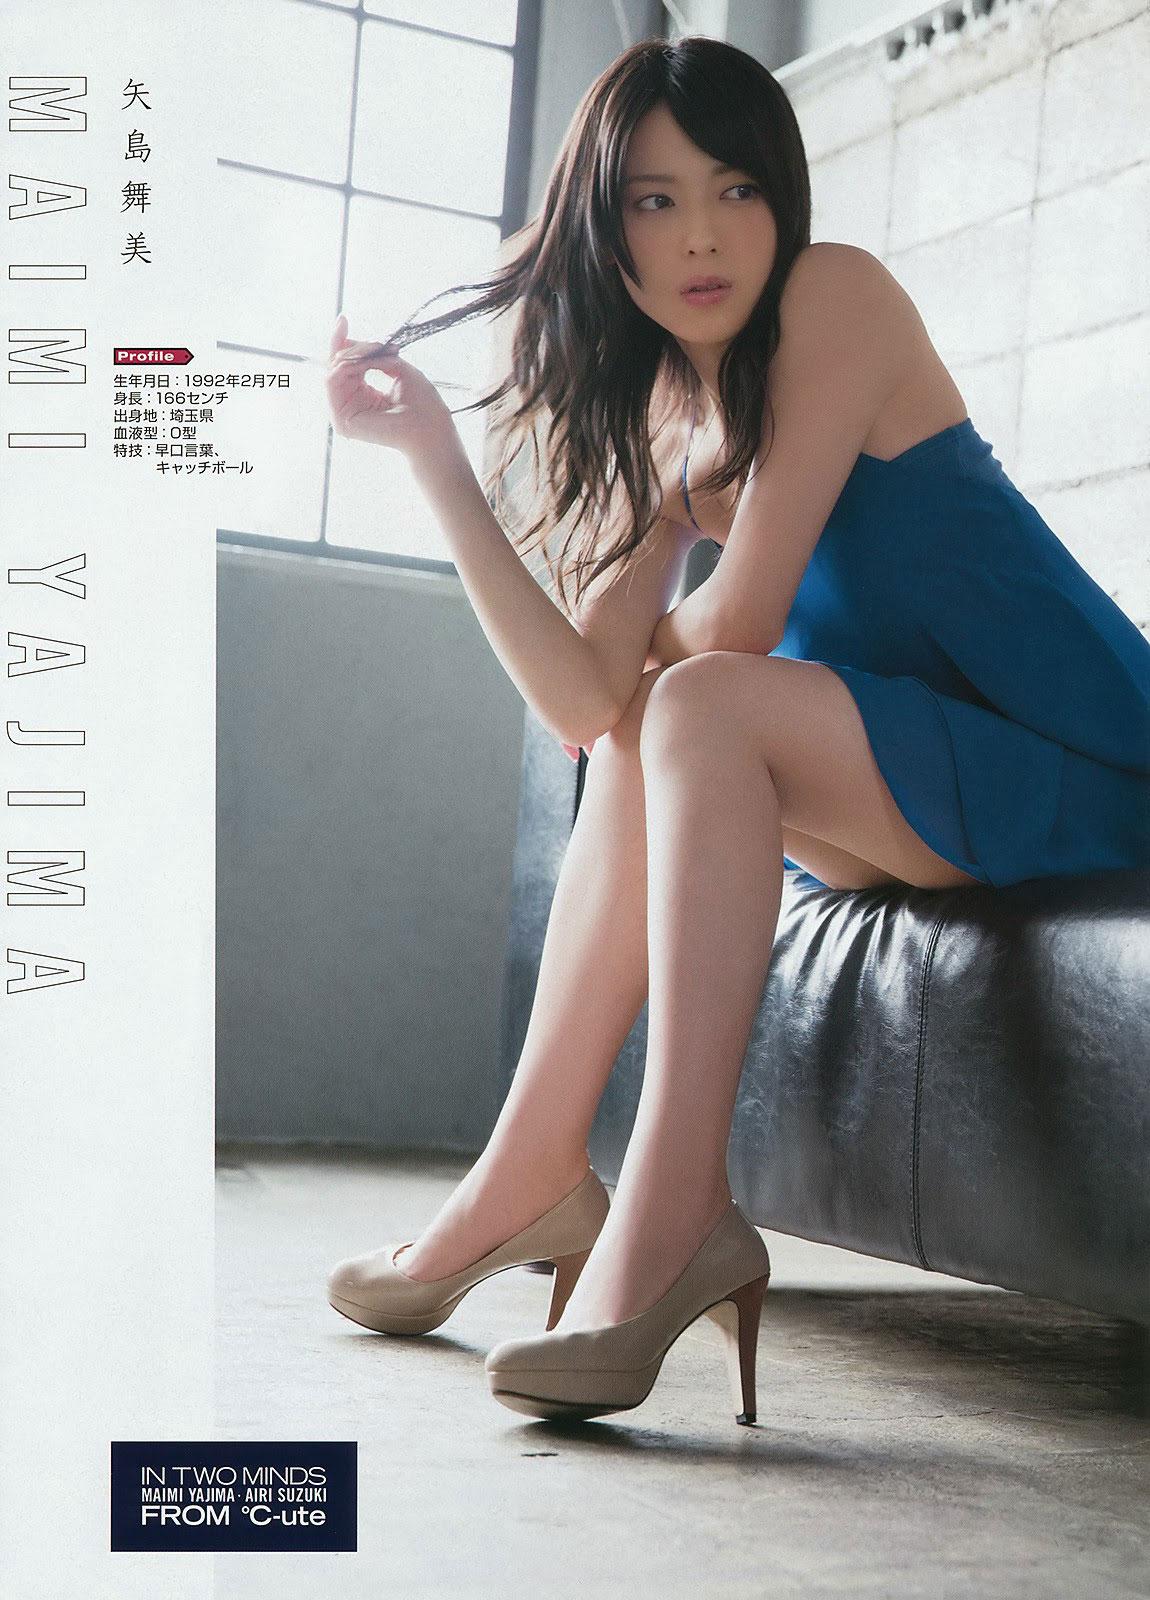 C-ute Maimi Yajima Japanese Young Gangan